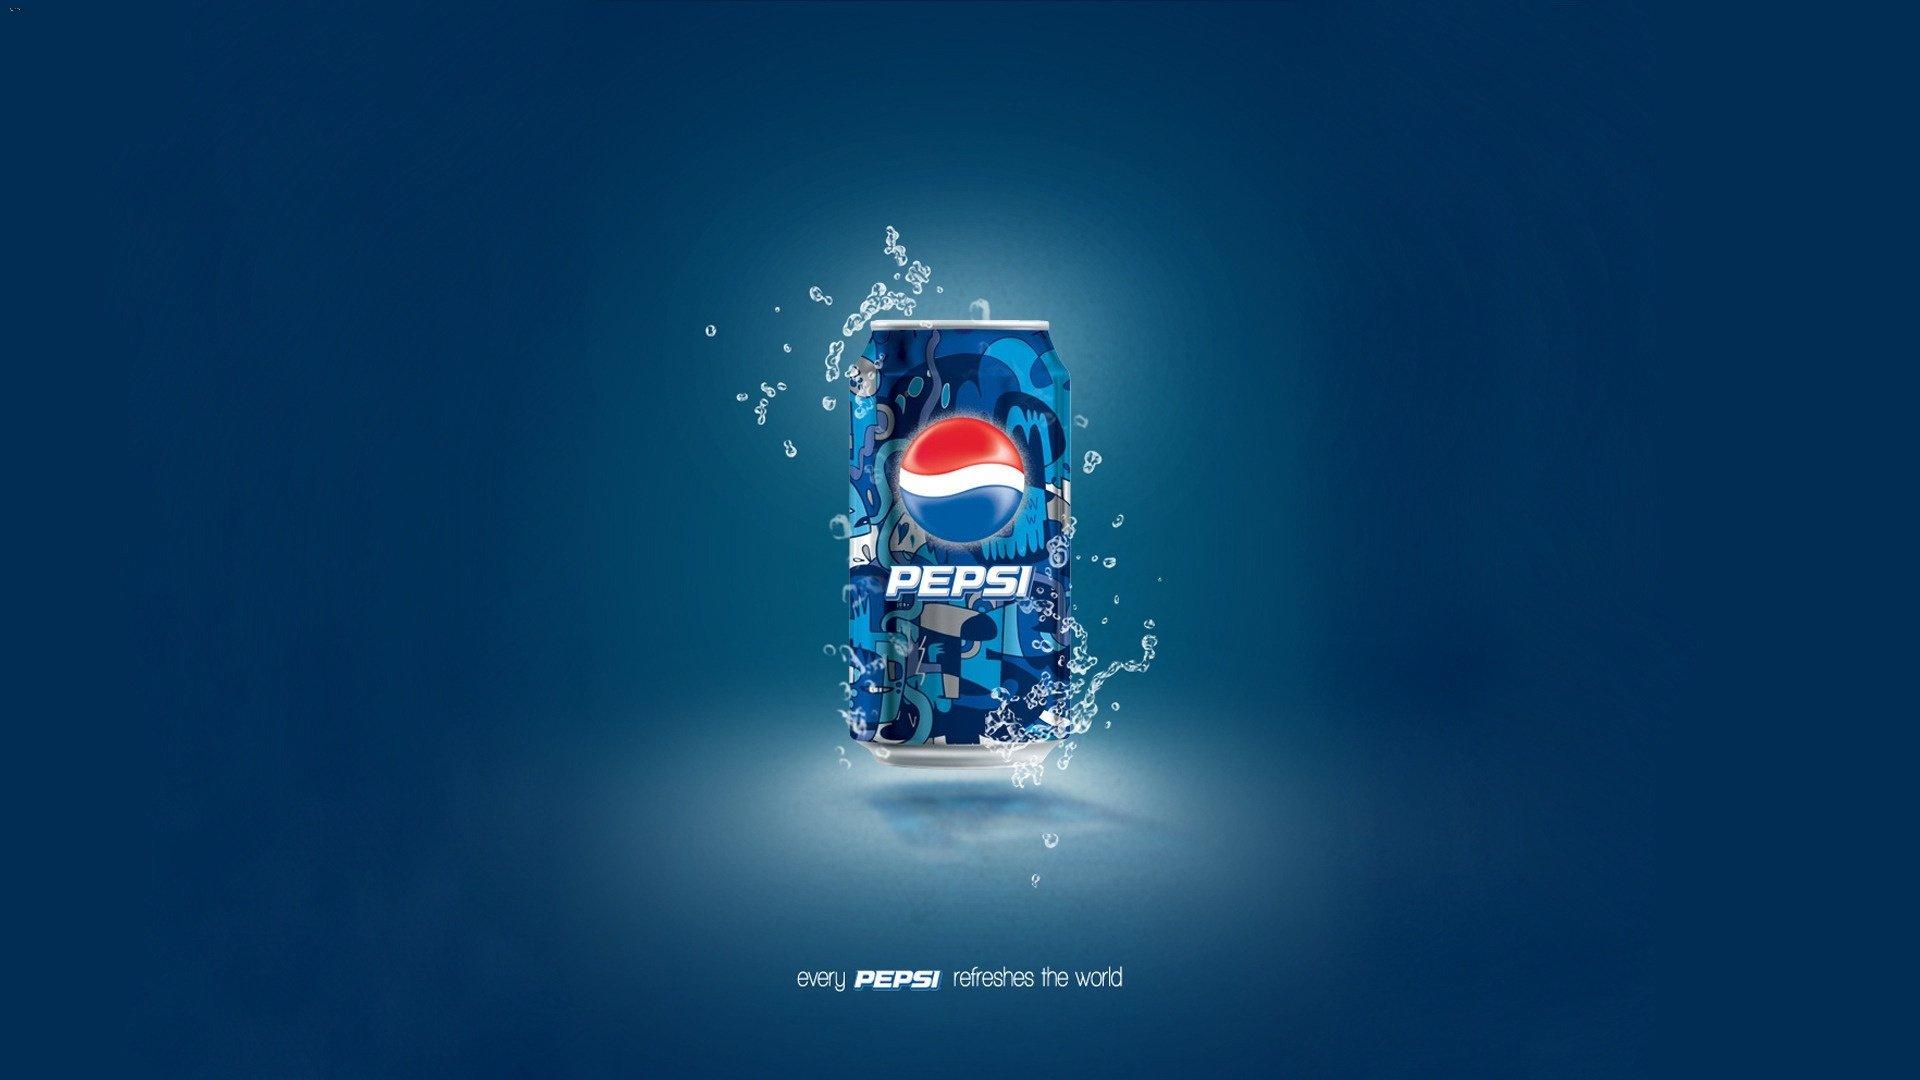 D logo Pepsi wallpaper by boopuffywallpapers on DeviantArt | HD ...